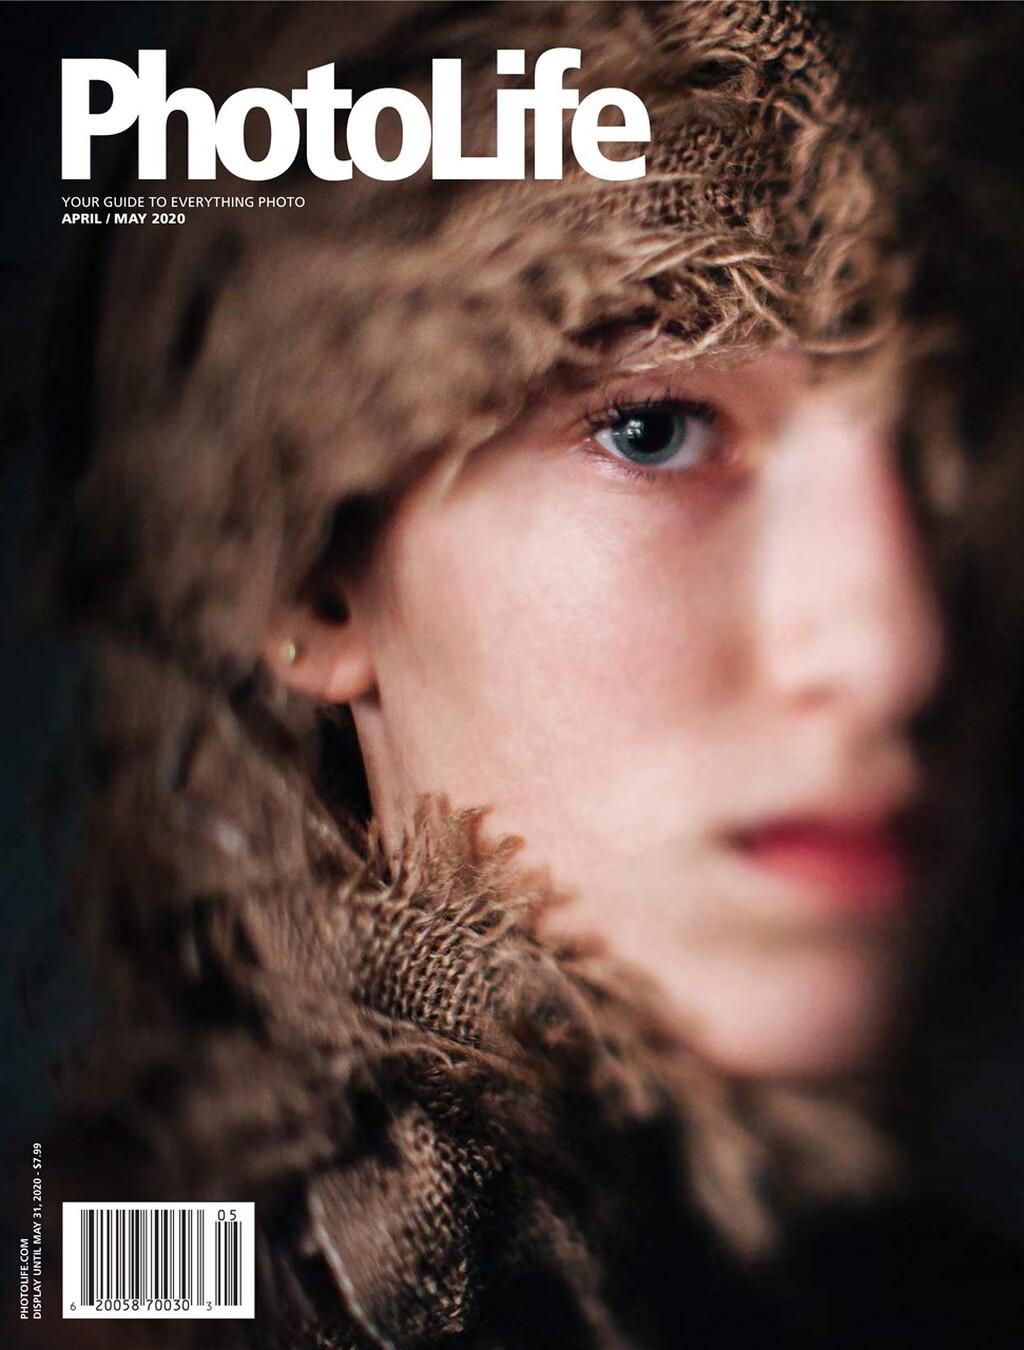 Cover of Photo Life magazine